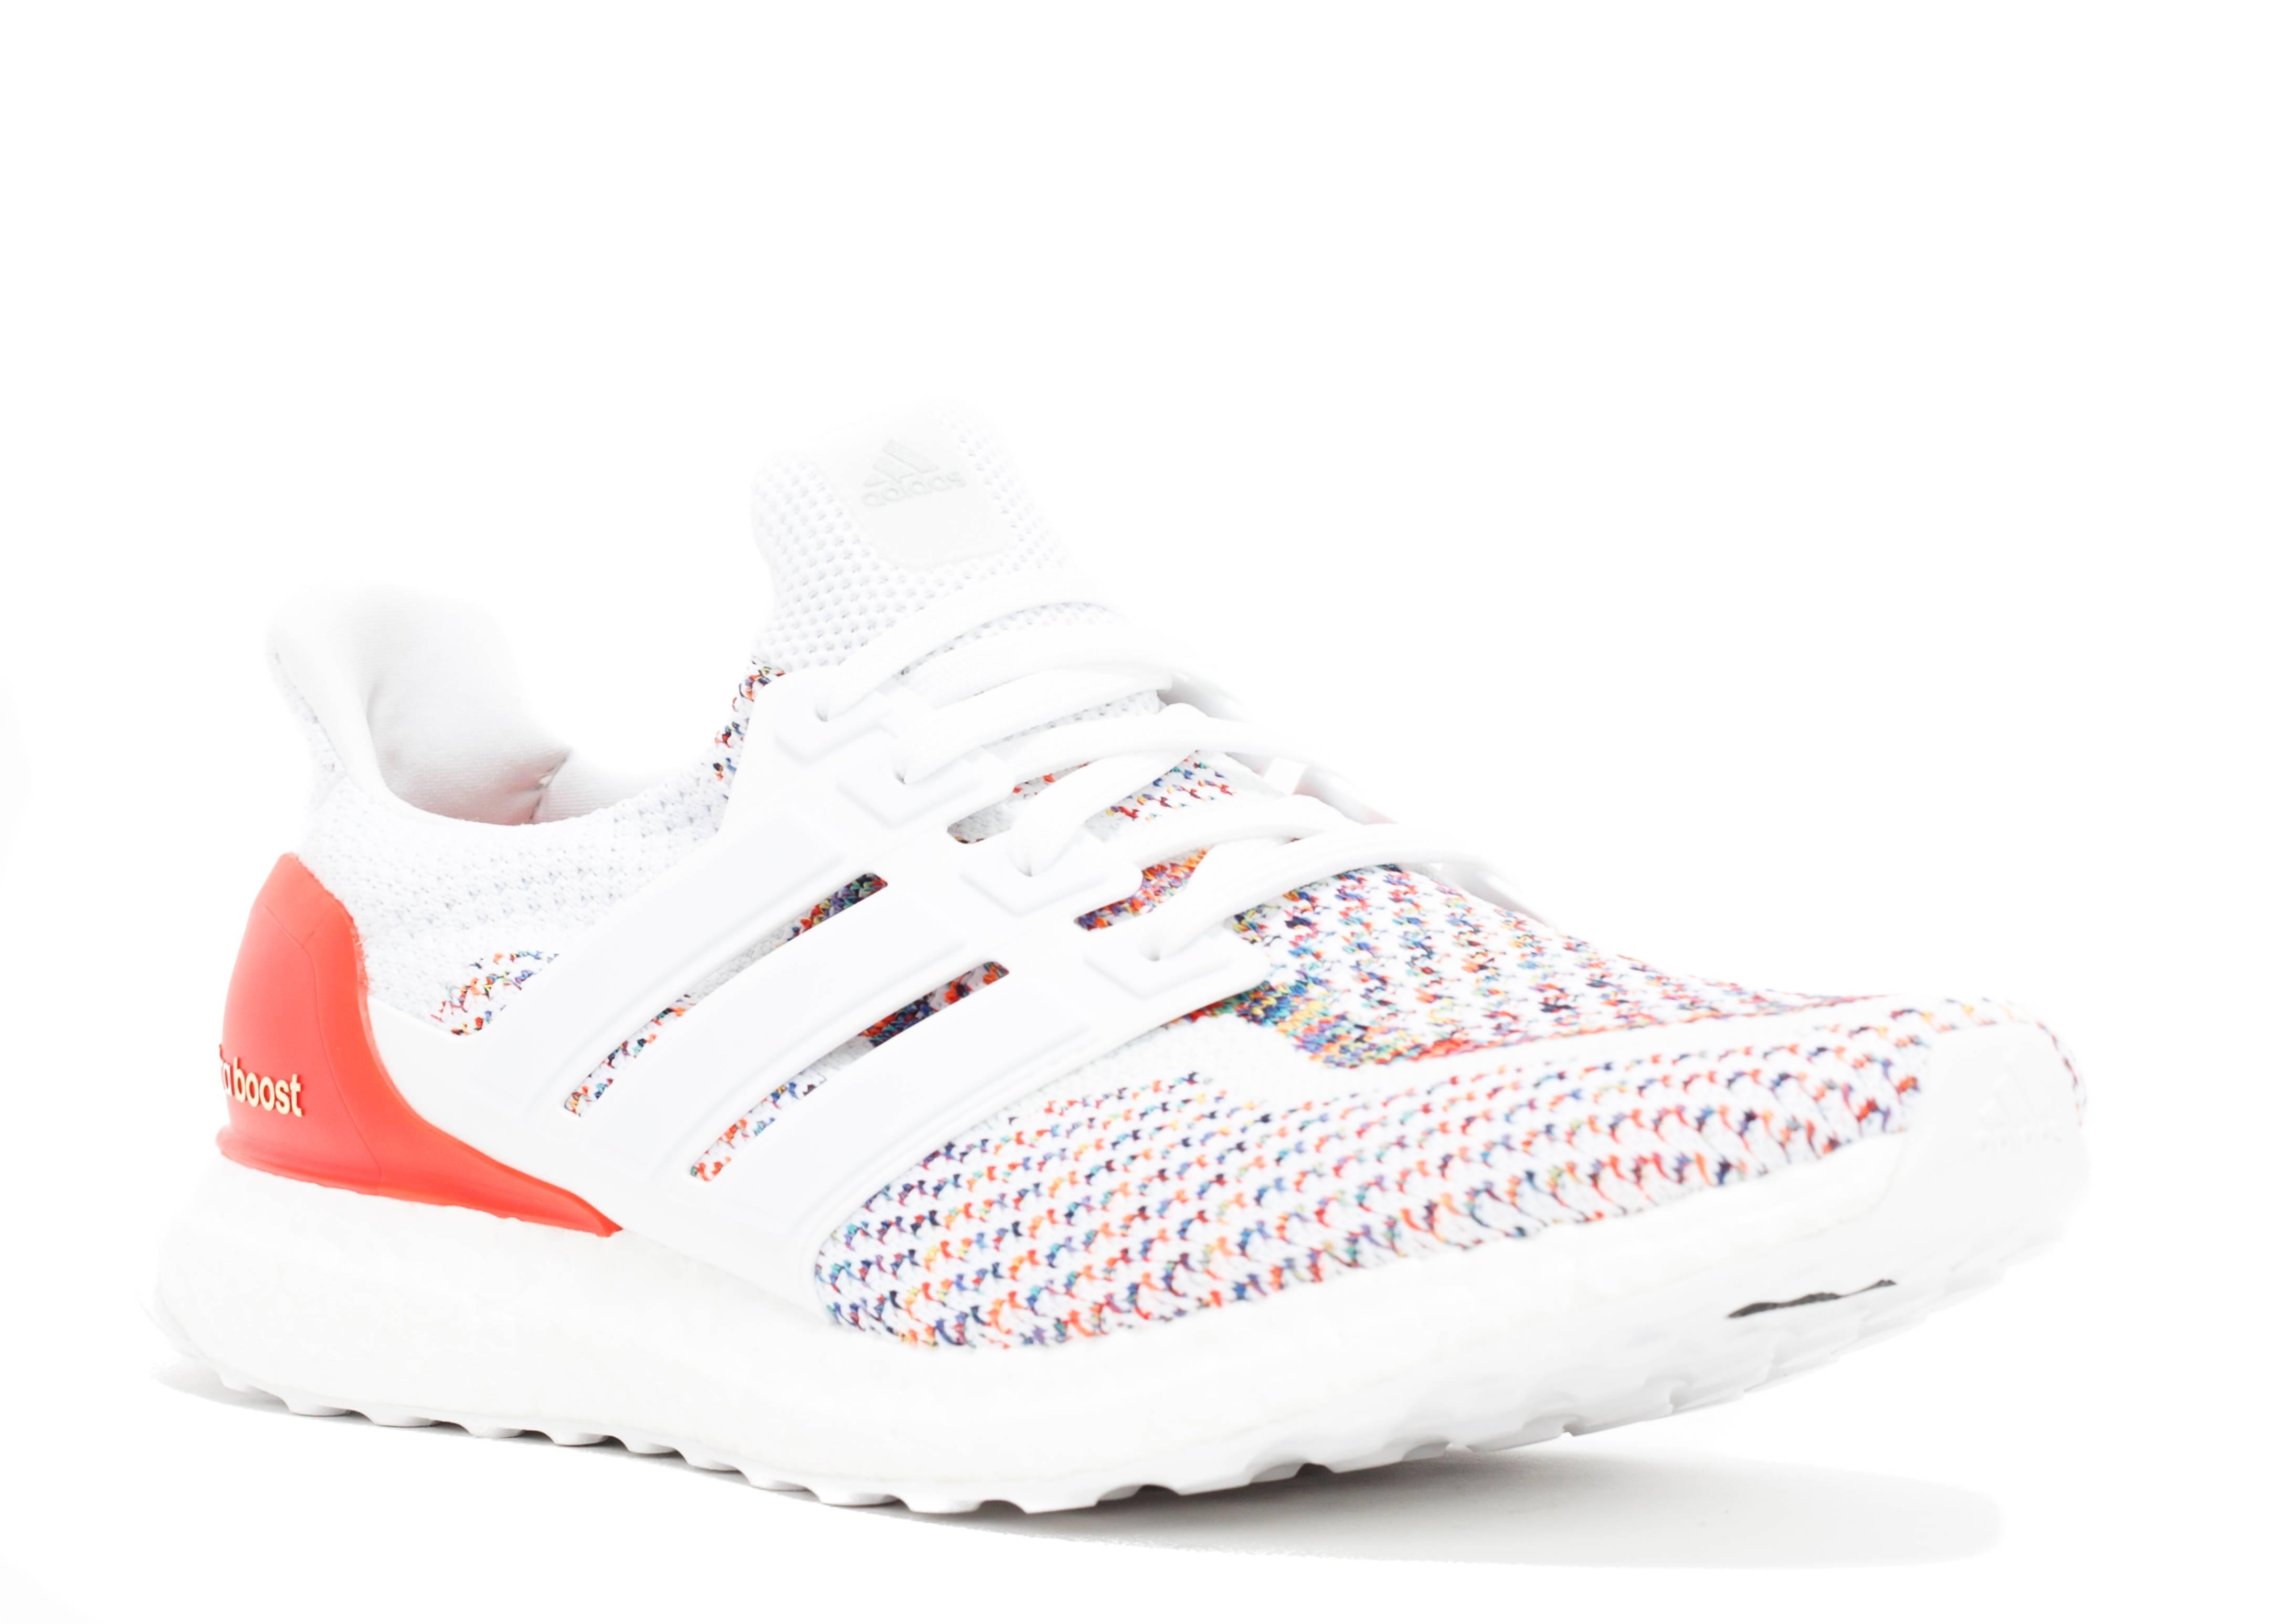 free shipping deebc 7b78b Adidas Ultra Boost 2.0 Multi-Color - 1